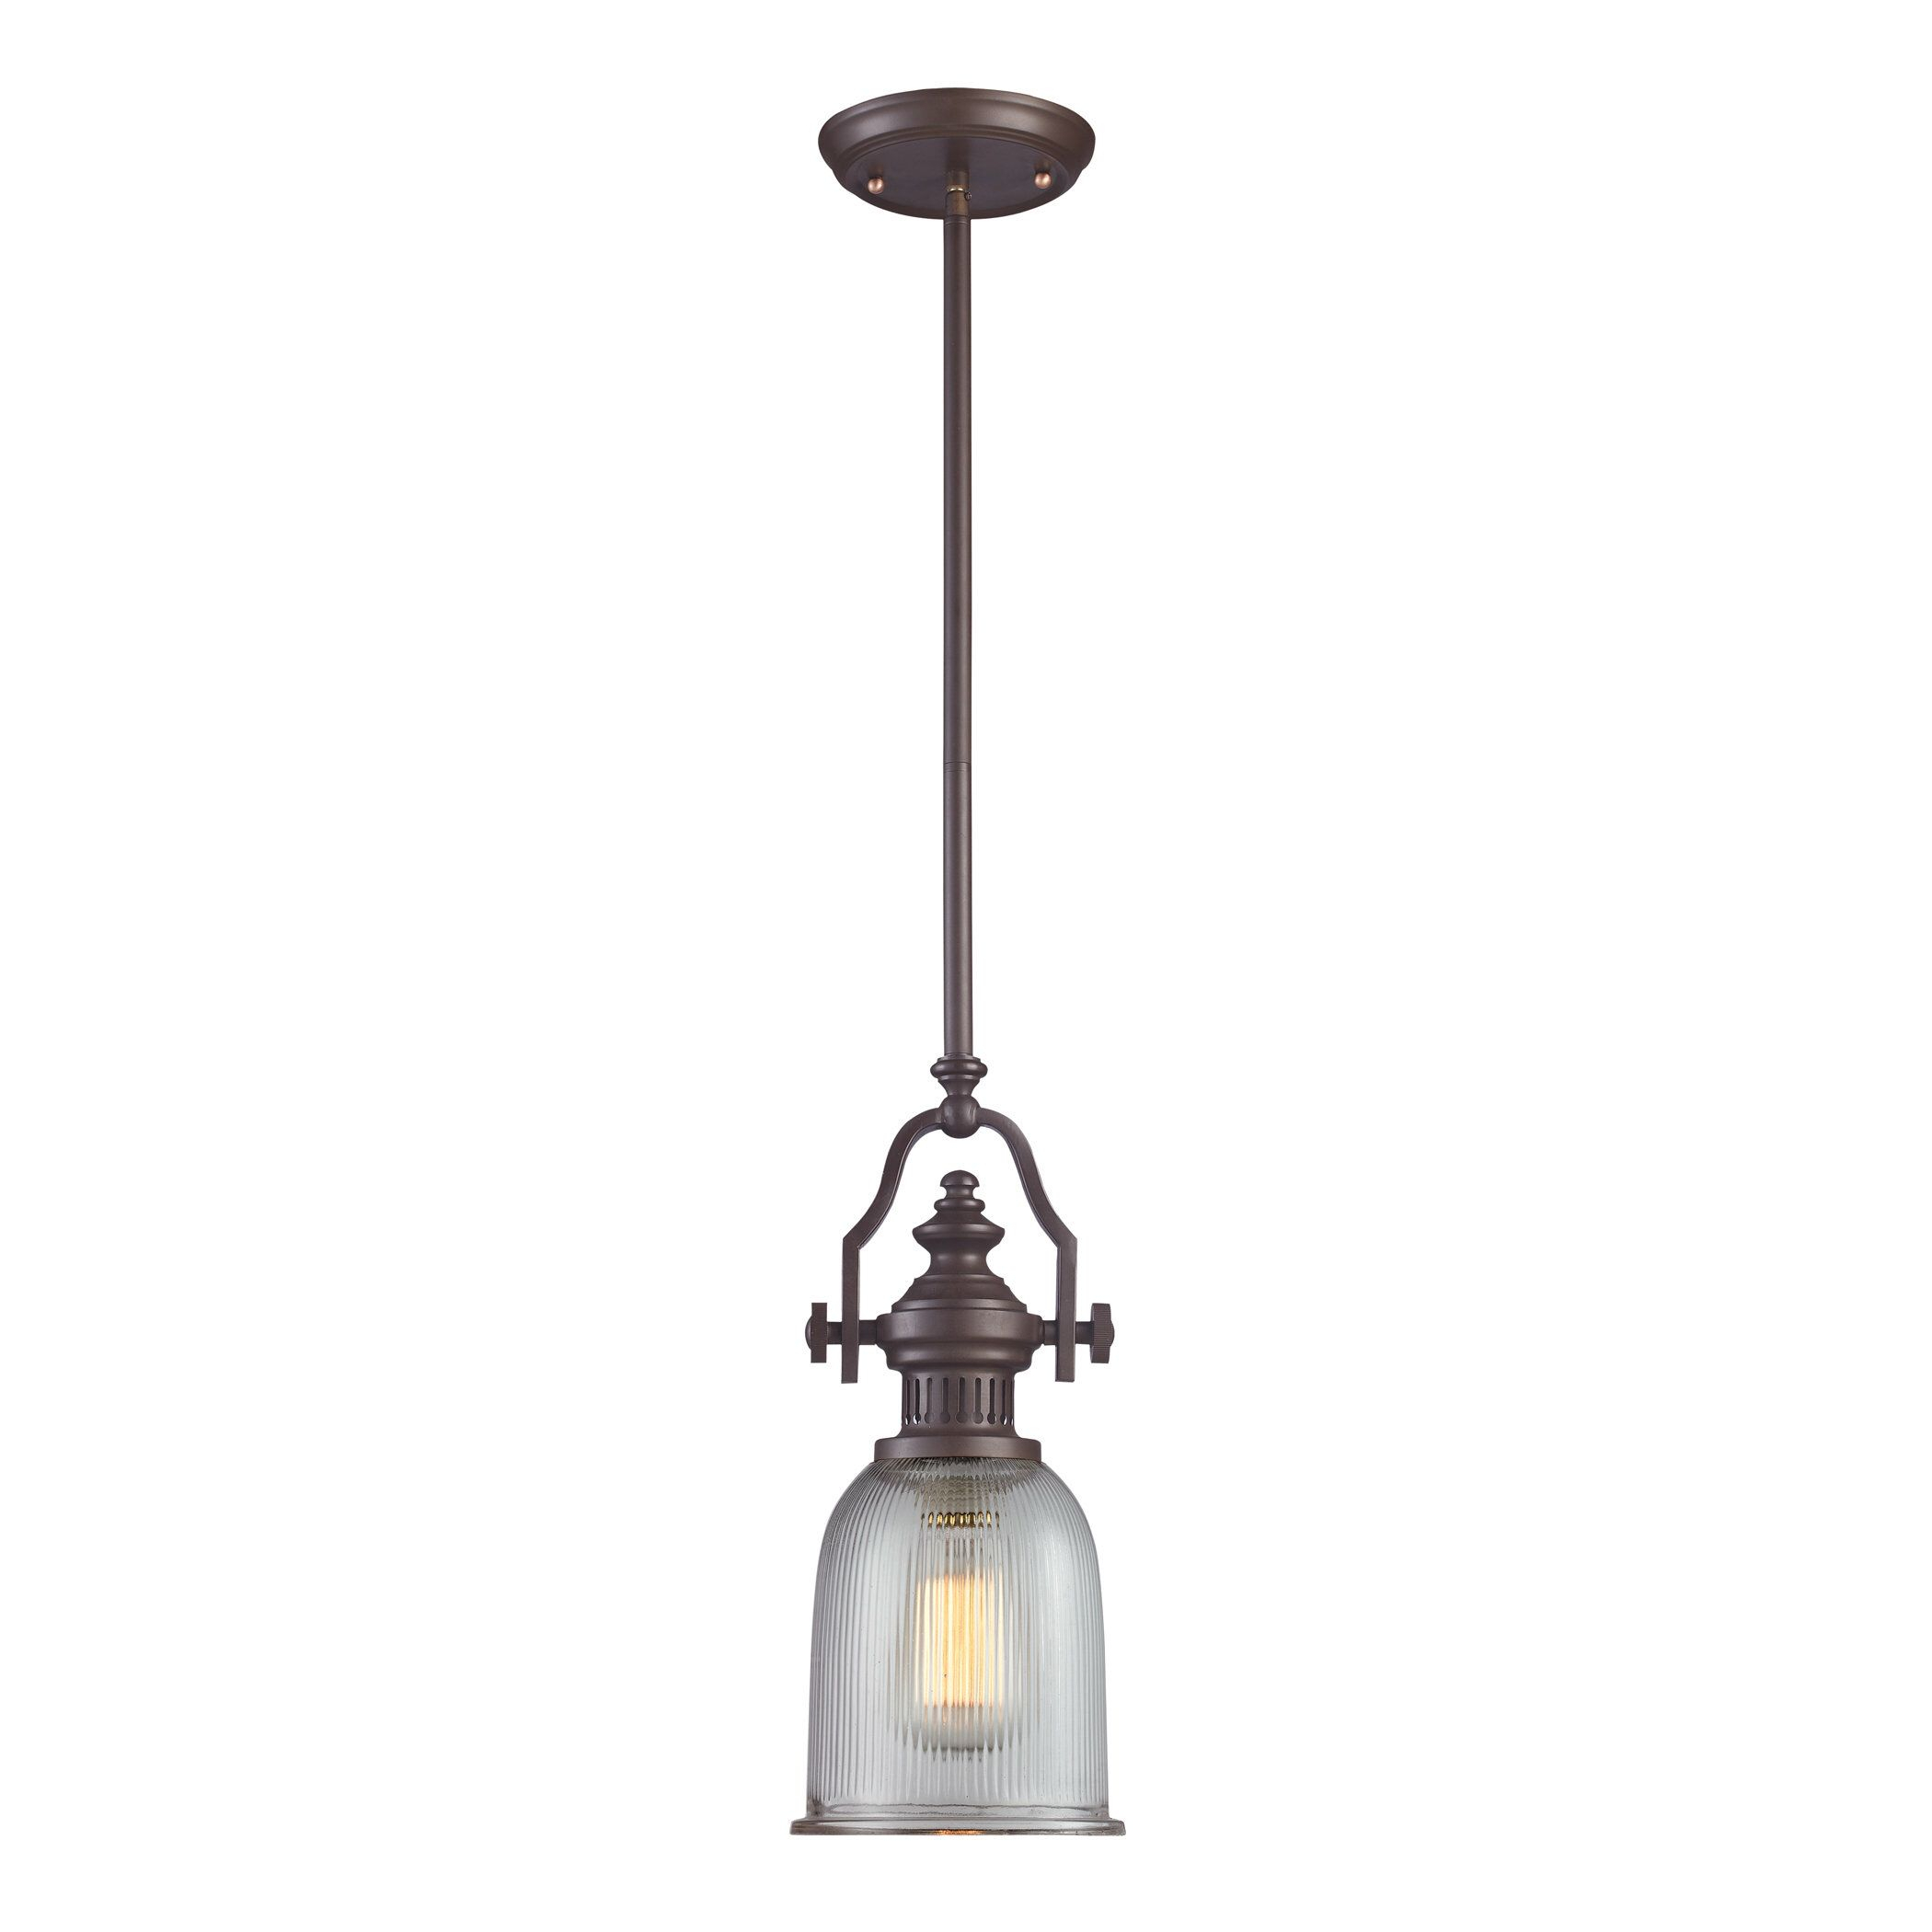 Erico 1 Light Cone Pendant | P22 | Pendant Lighting, Mini With Erico 1 Light Single Bell Pendants (Gallery 10 of 30)